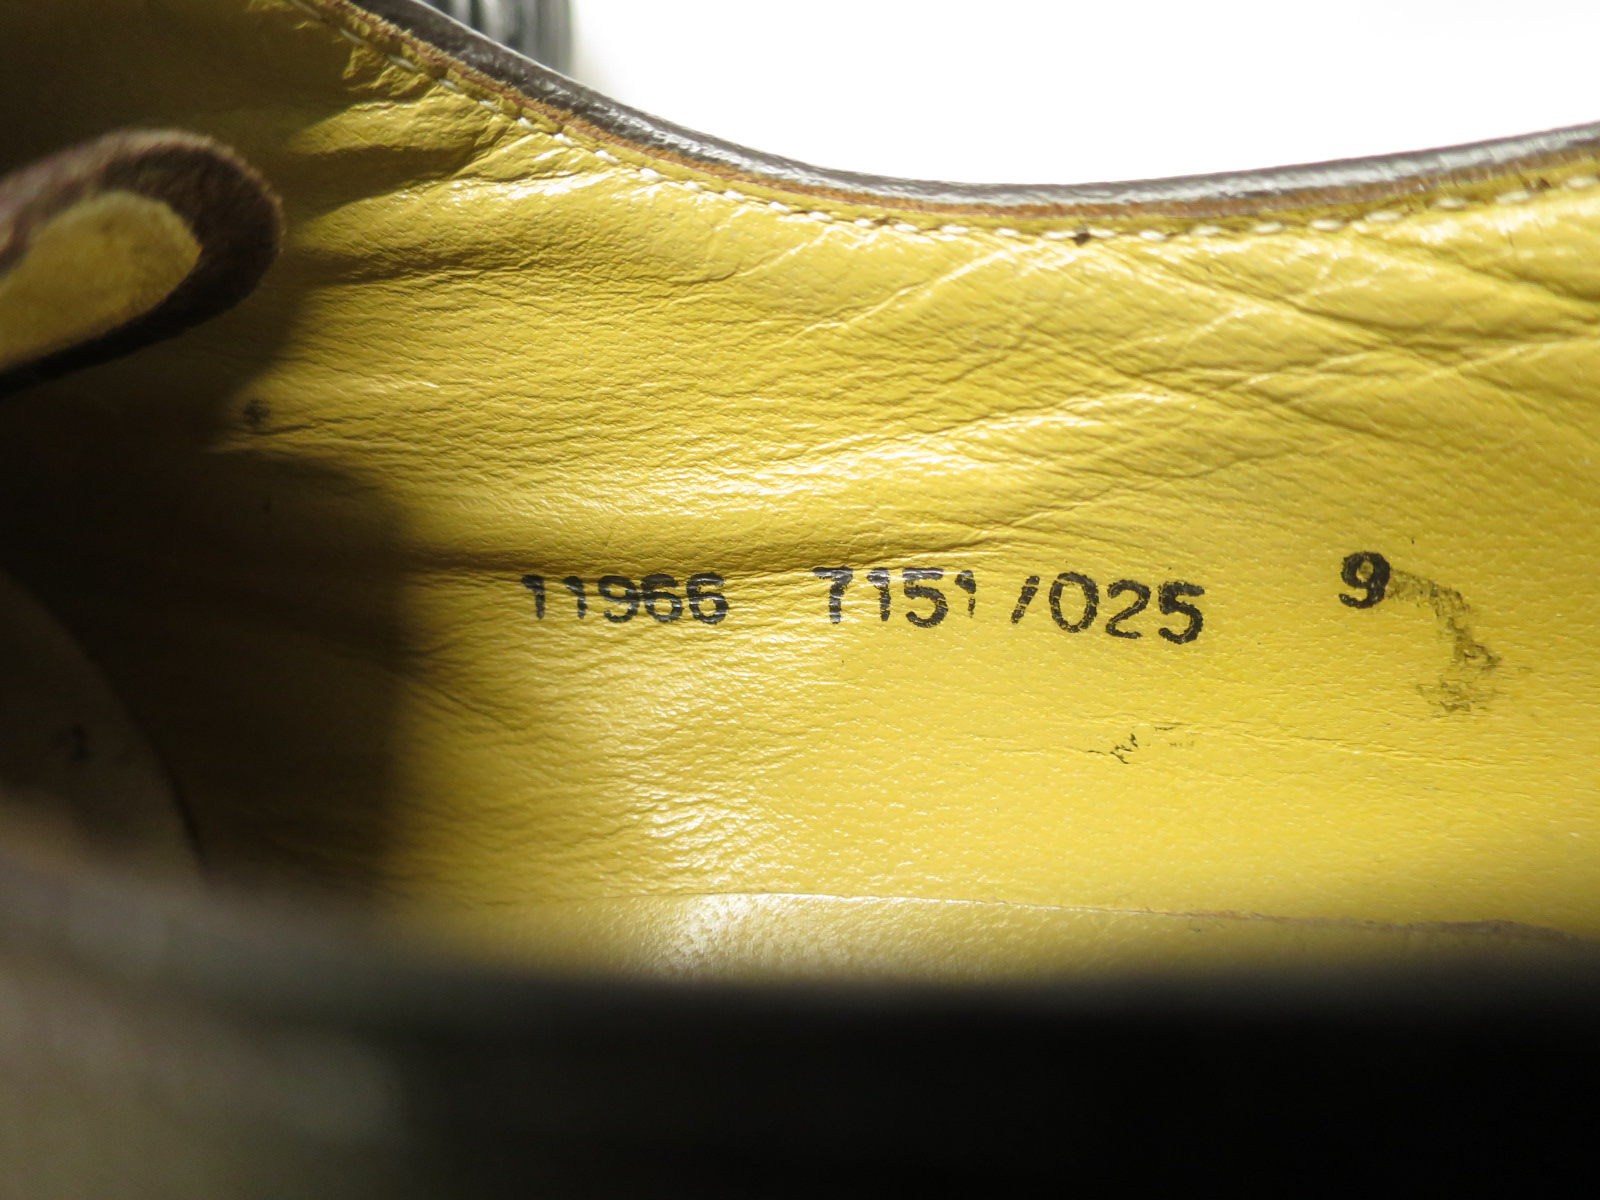 B19EB5DC-87FD-423E-8BAD-A9C8EAE18B55.jpeg